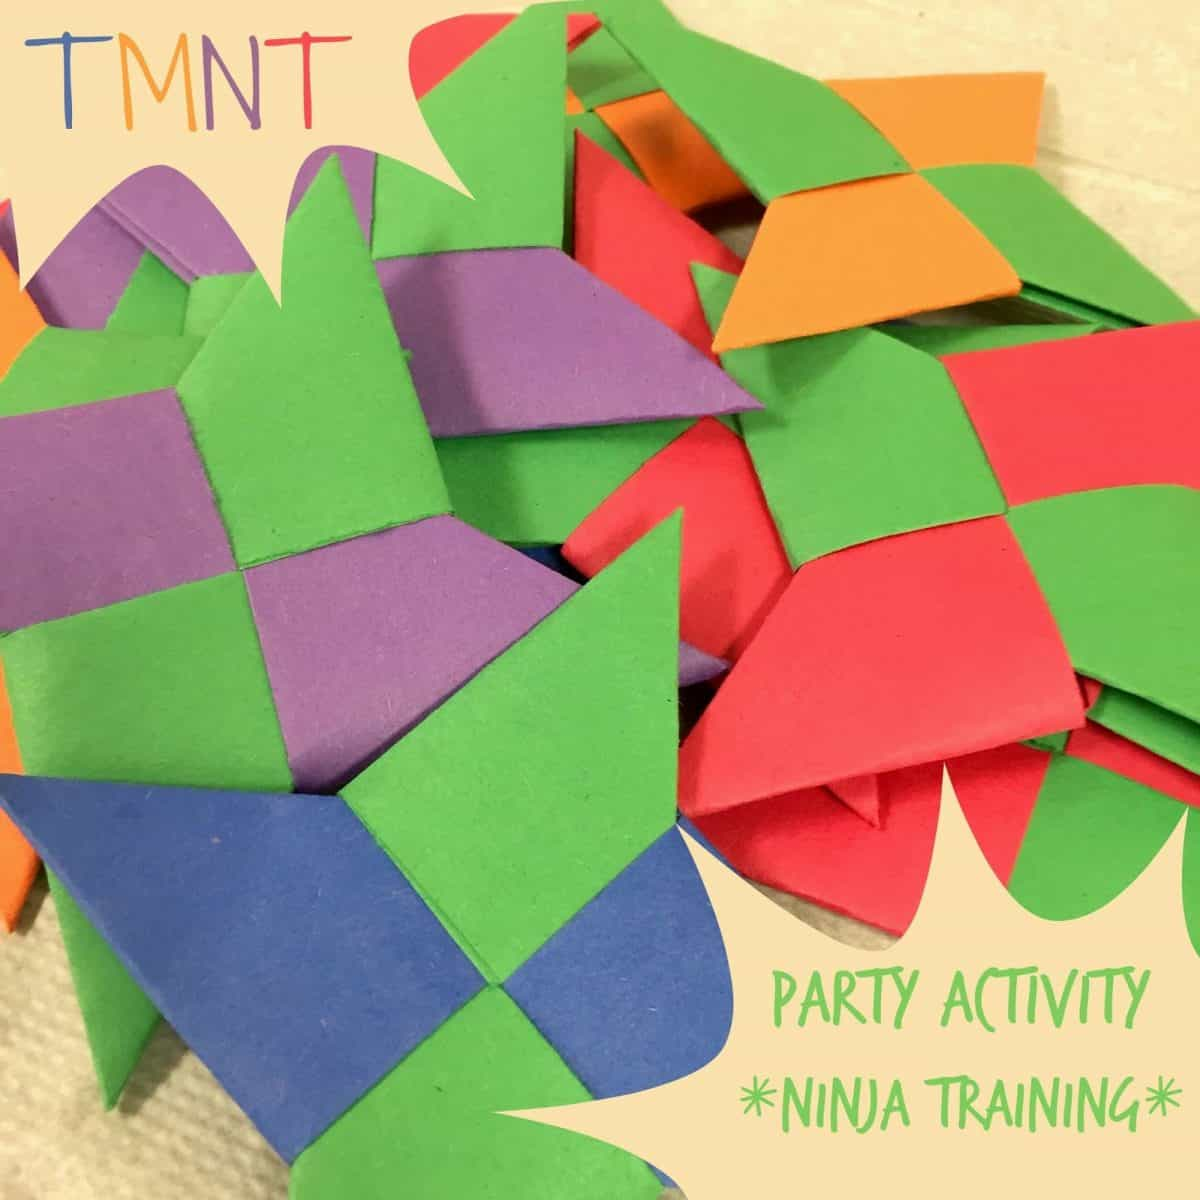 A Teenage Mutant Ninja Turtles Party Activity Enter The Hashi